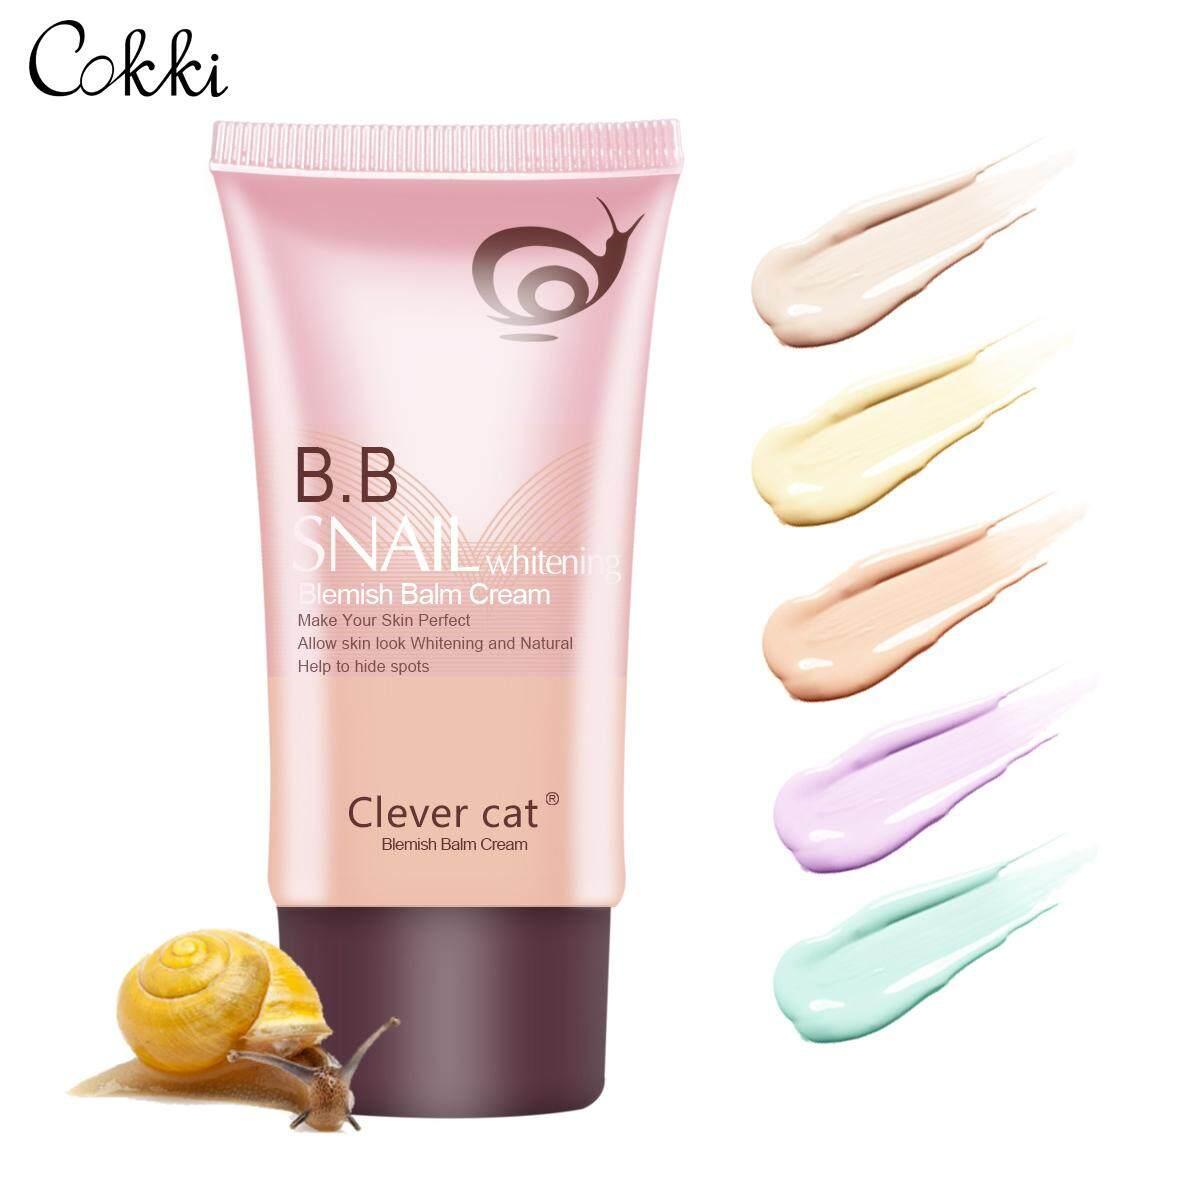 Clever Cat  8458 Bb Cream Face Care Foundation Base Bb Cream Perfect Cover Facial Whitening Concealer Primer-Cokkicosmtic การบำรุงรักษาความชุ่มชื่น หอยทาก บำรุงผิวขาว ครีมรองพื้น.